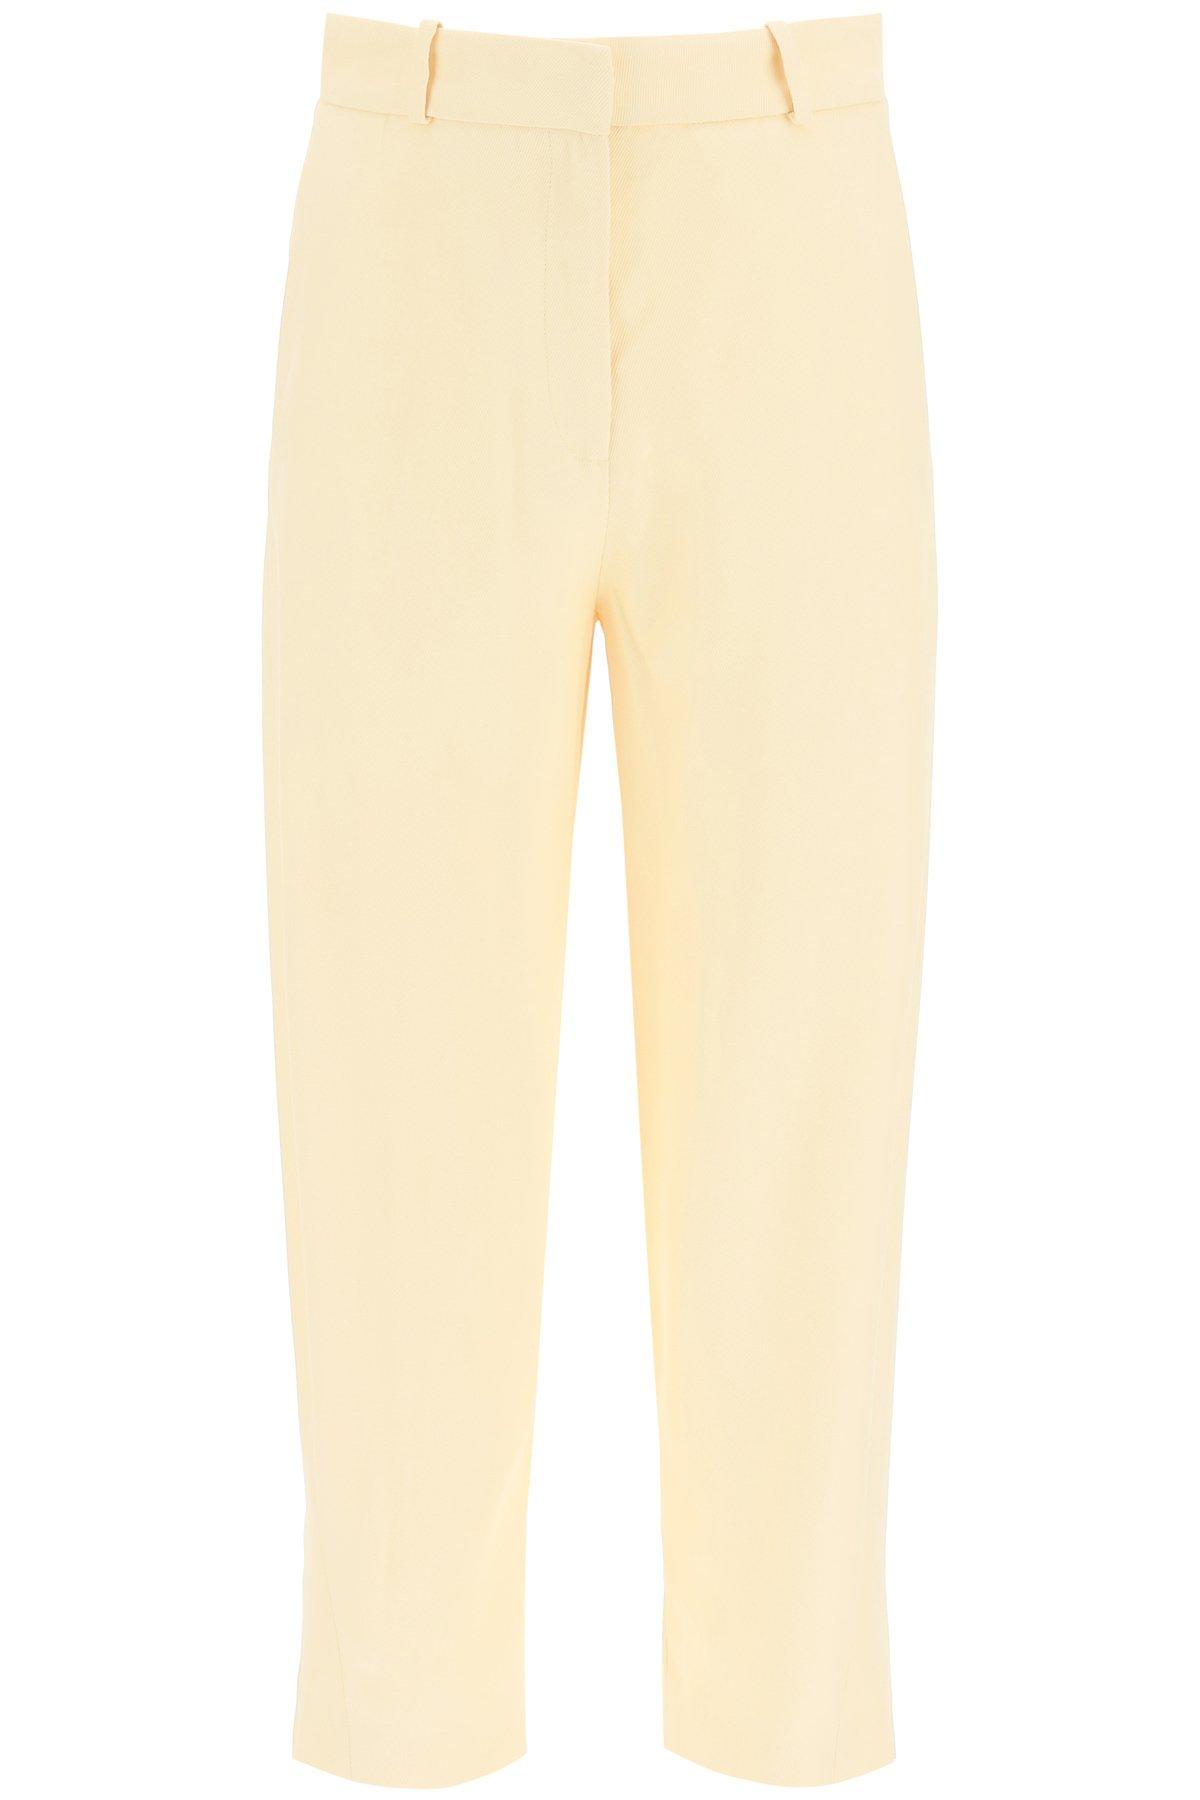 Toteme pantaloni in viscosa twisted seam